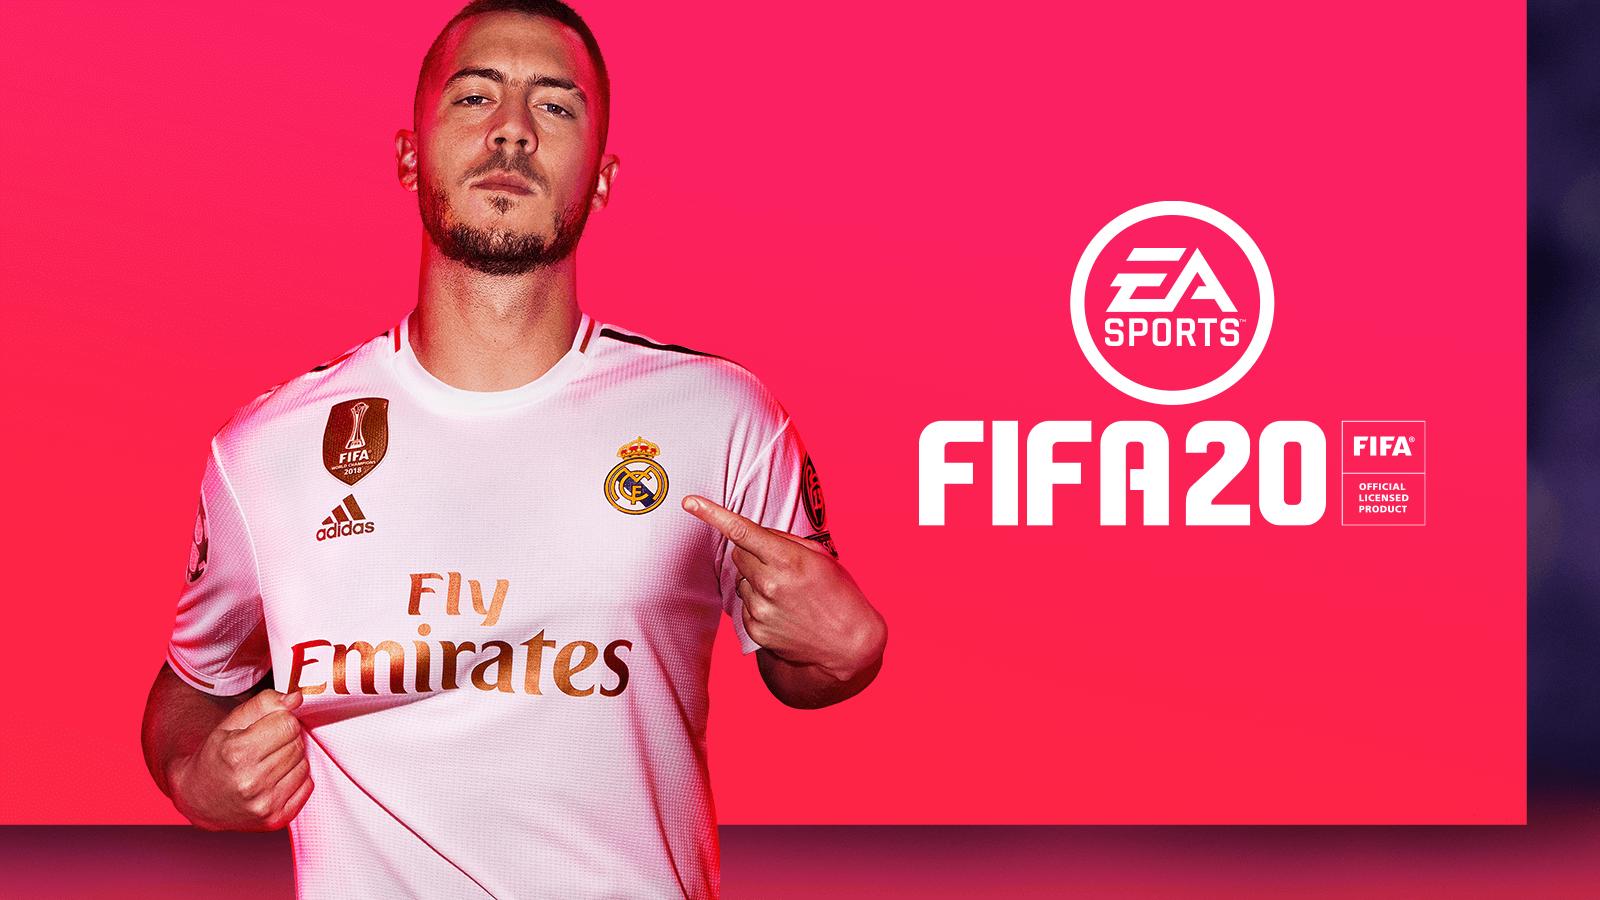 EA Sports filtró los 20 mejores defensores de FIFA 20